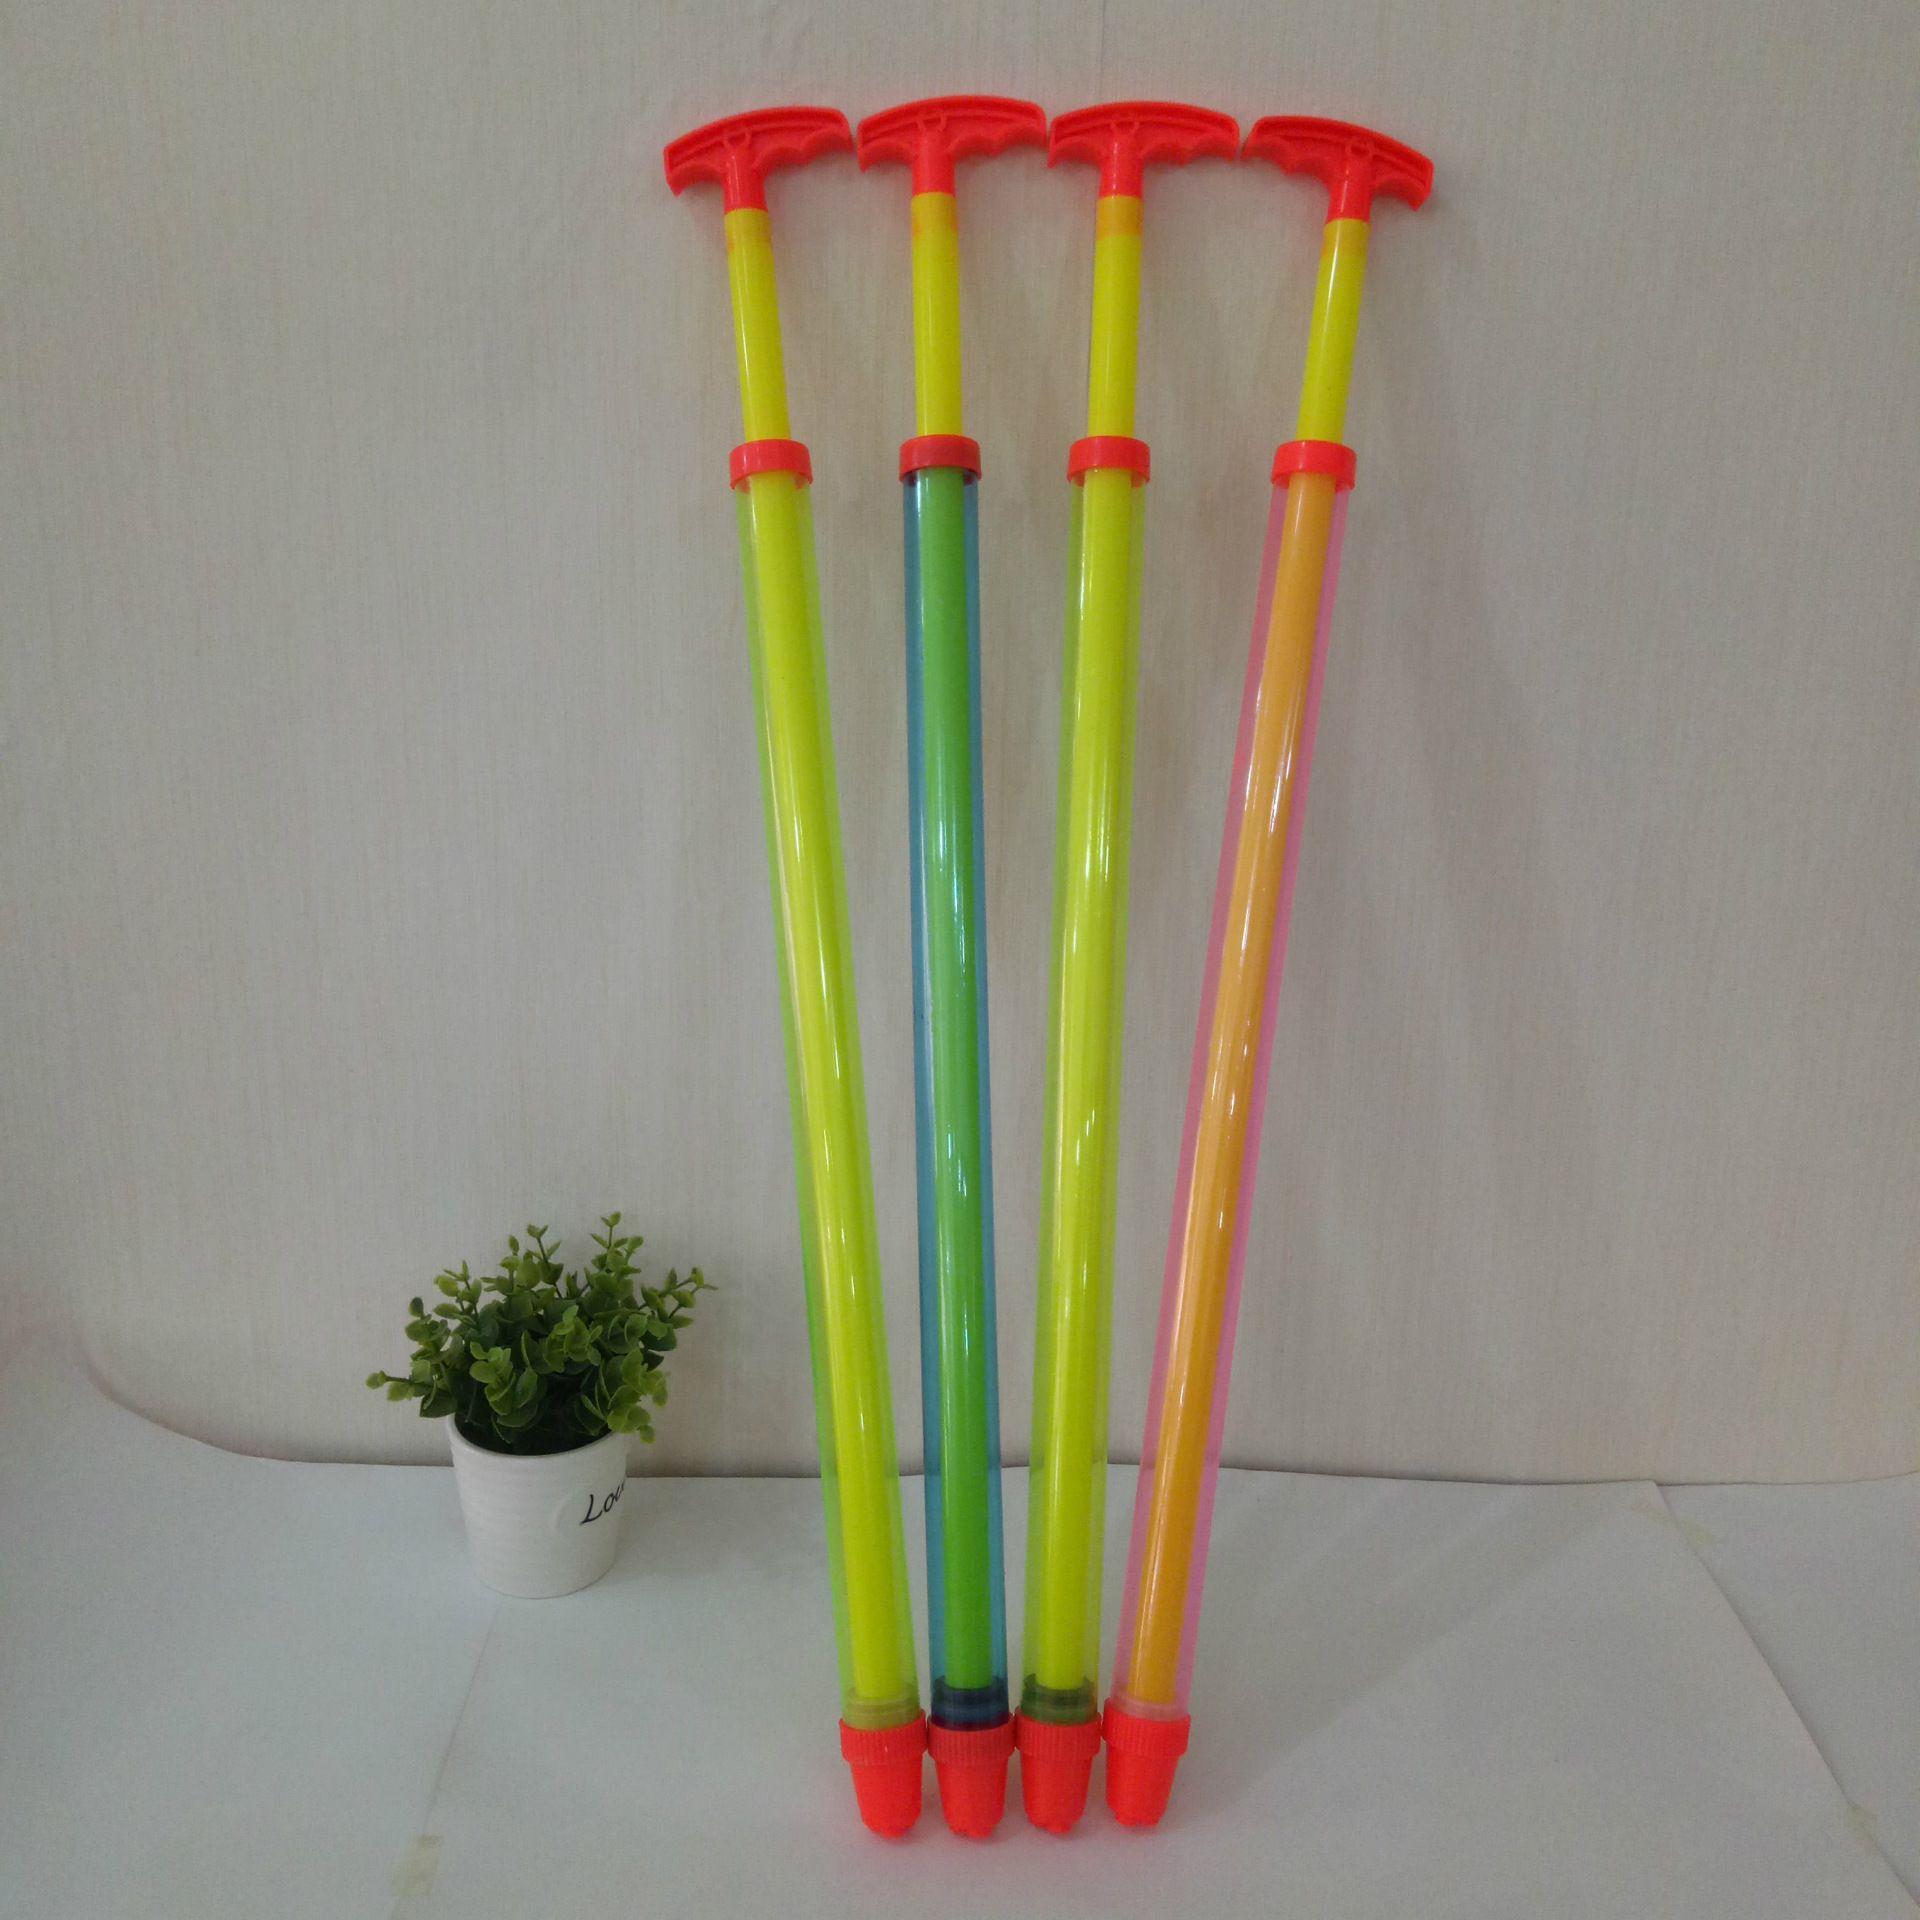 Children's splashing toy, pulling type single tube drifting water gun, high pressure syringe barrel, long-distance porous water cannon